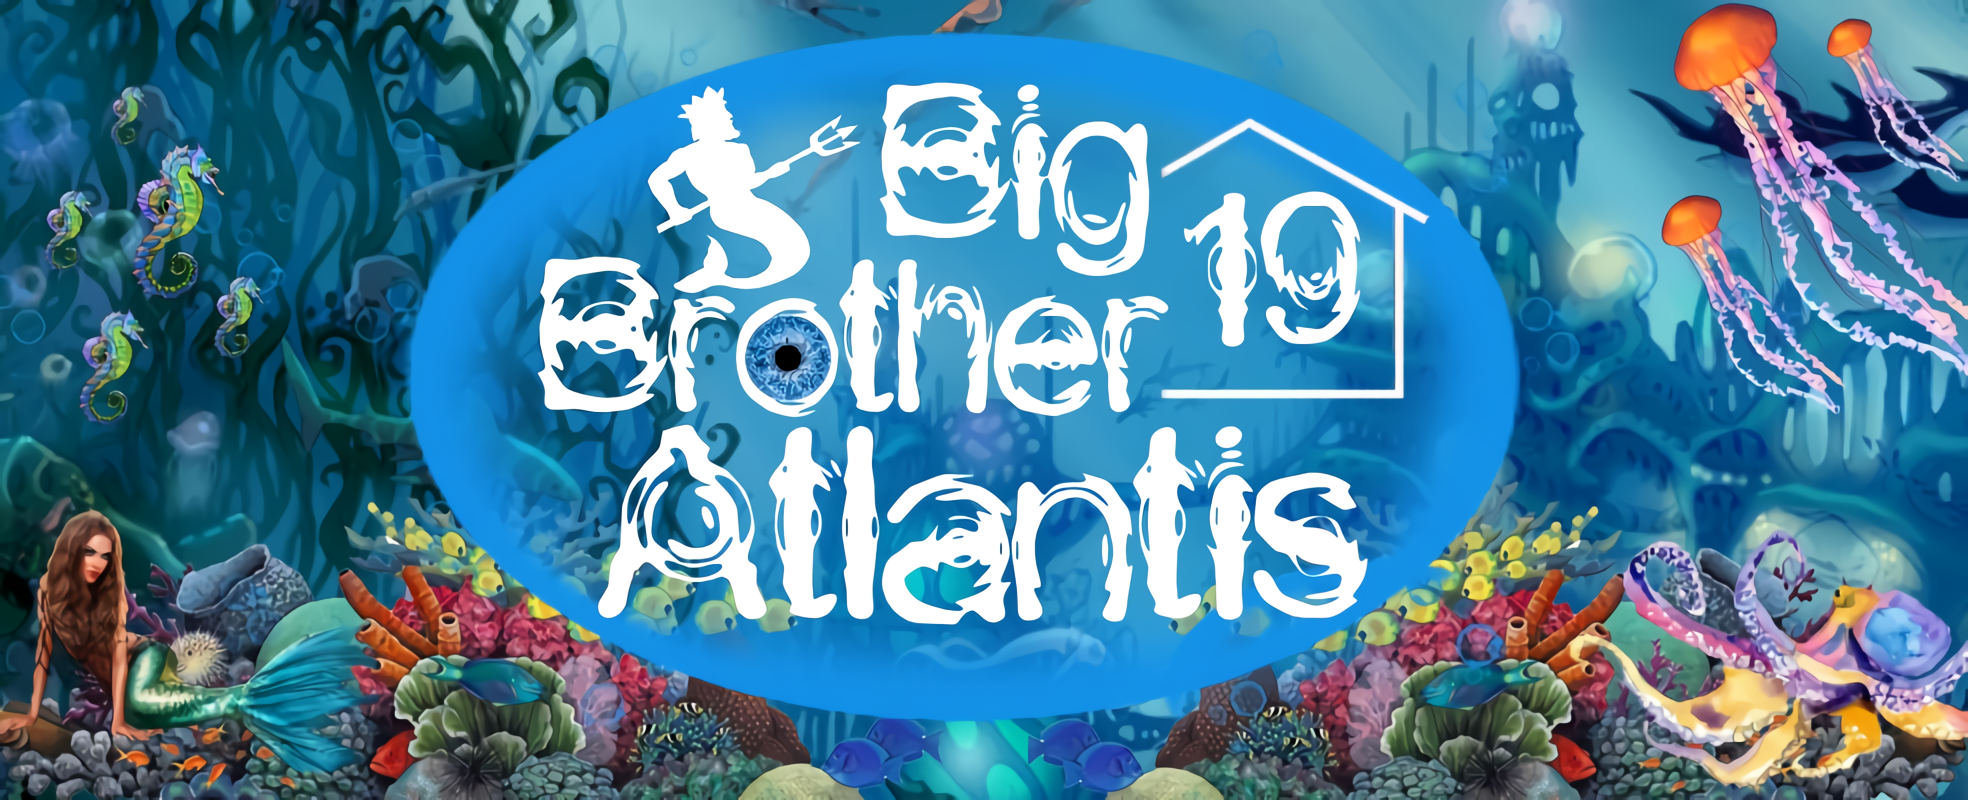 Big Brother 19   BigBrotherOrg Wiki   Fandom